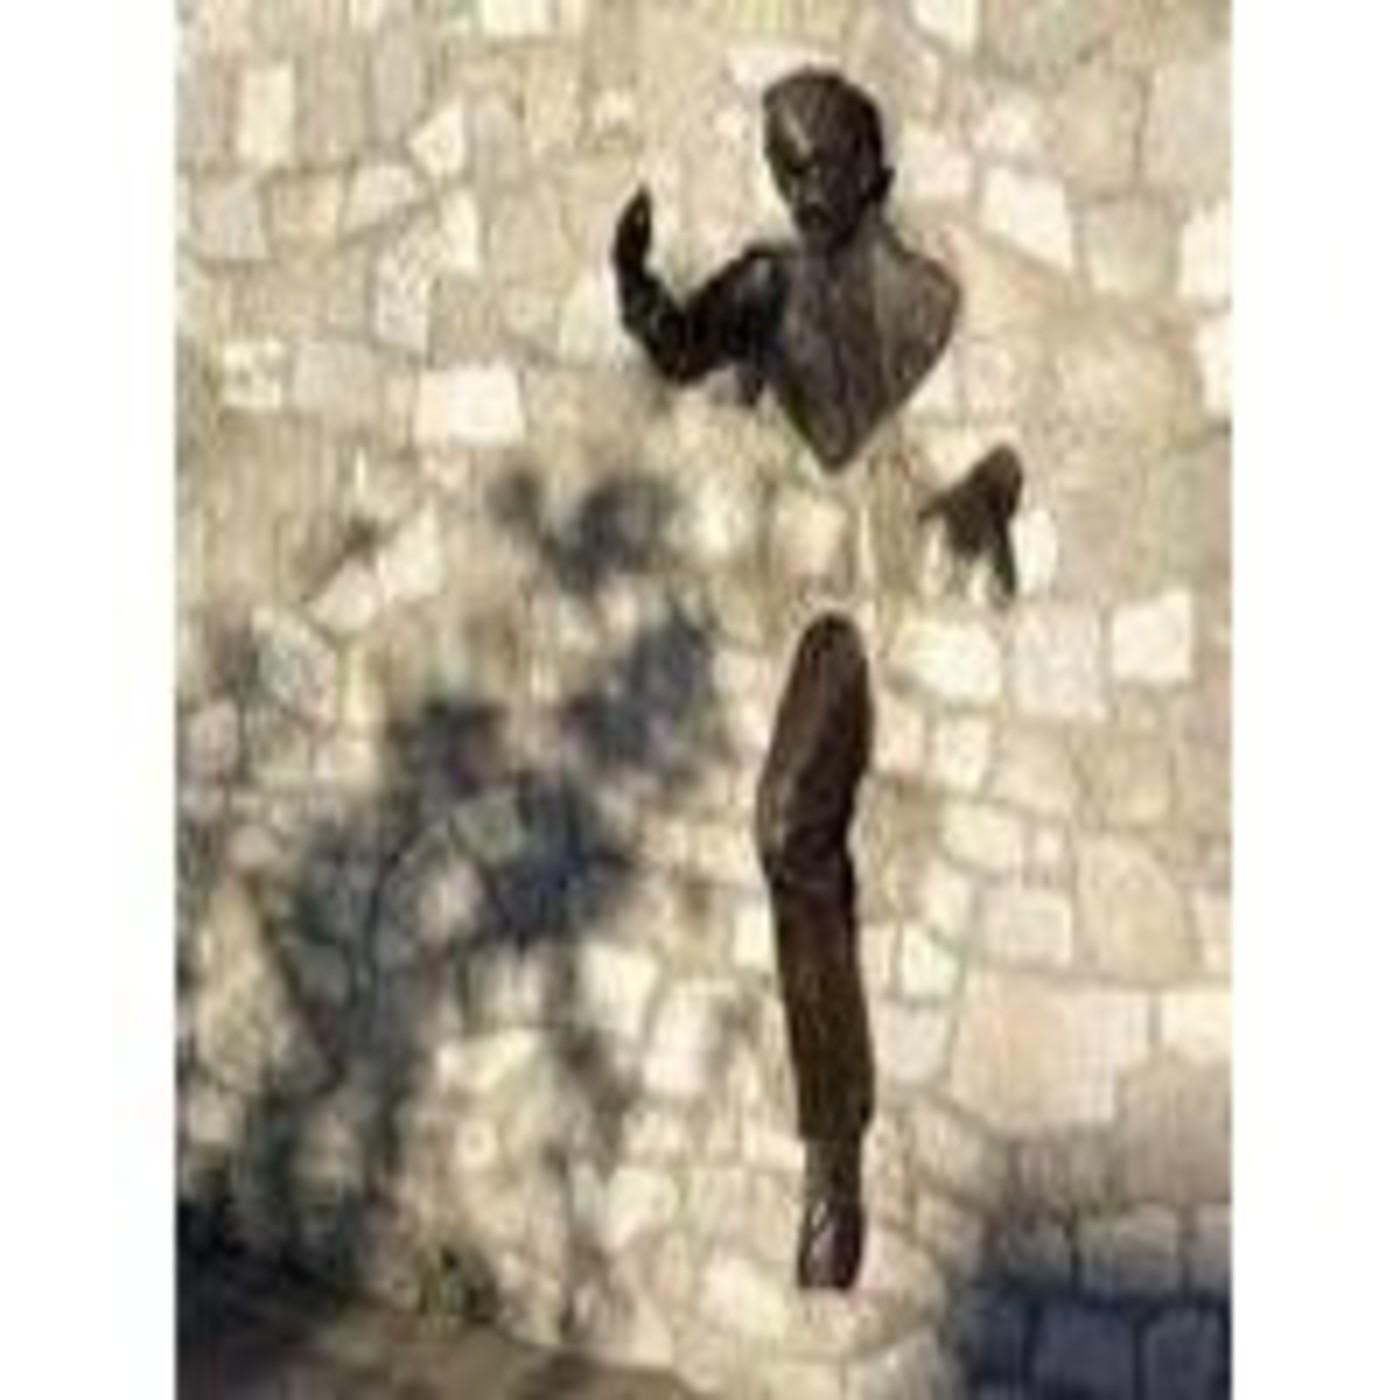 190 - Inquietantes humanoides Vol.4 - La venganza de los humanoides